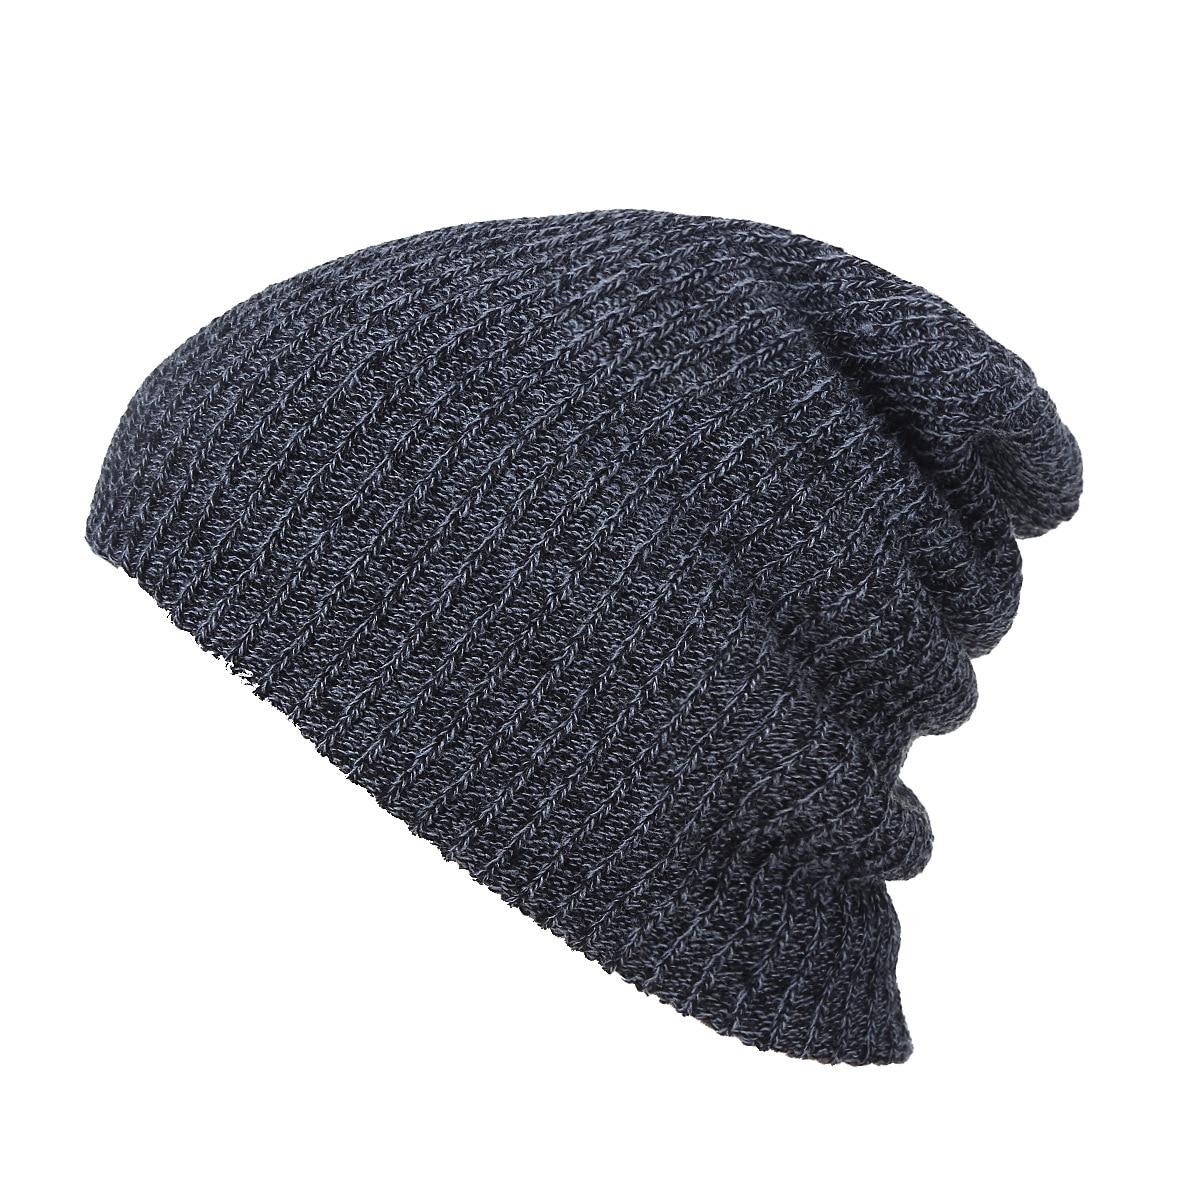 COKK Χειμερινά Καπέλα για Άντρες - Αξεσουάρ ένδυσης - Φωτογραφία 3